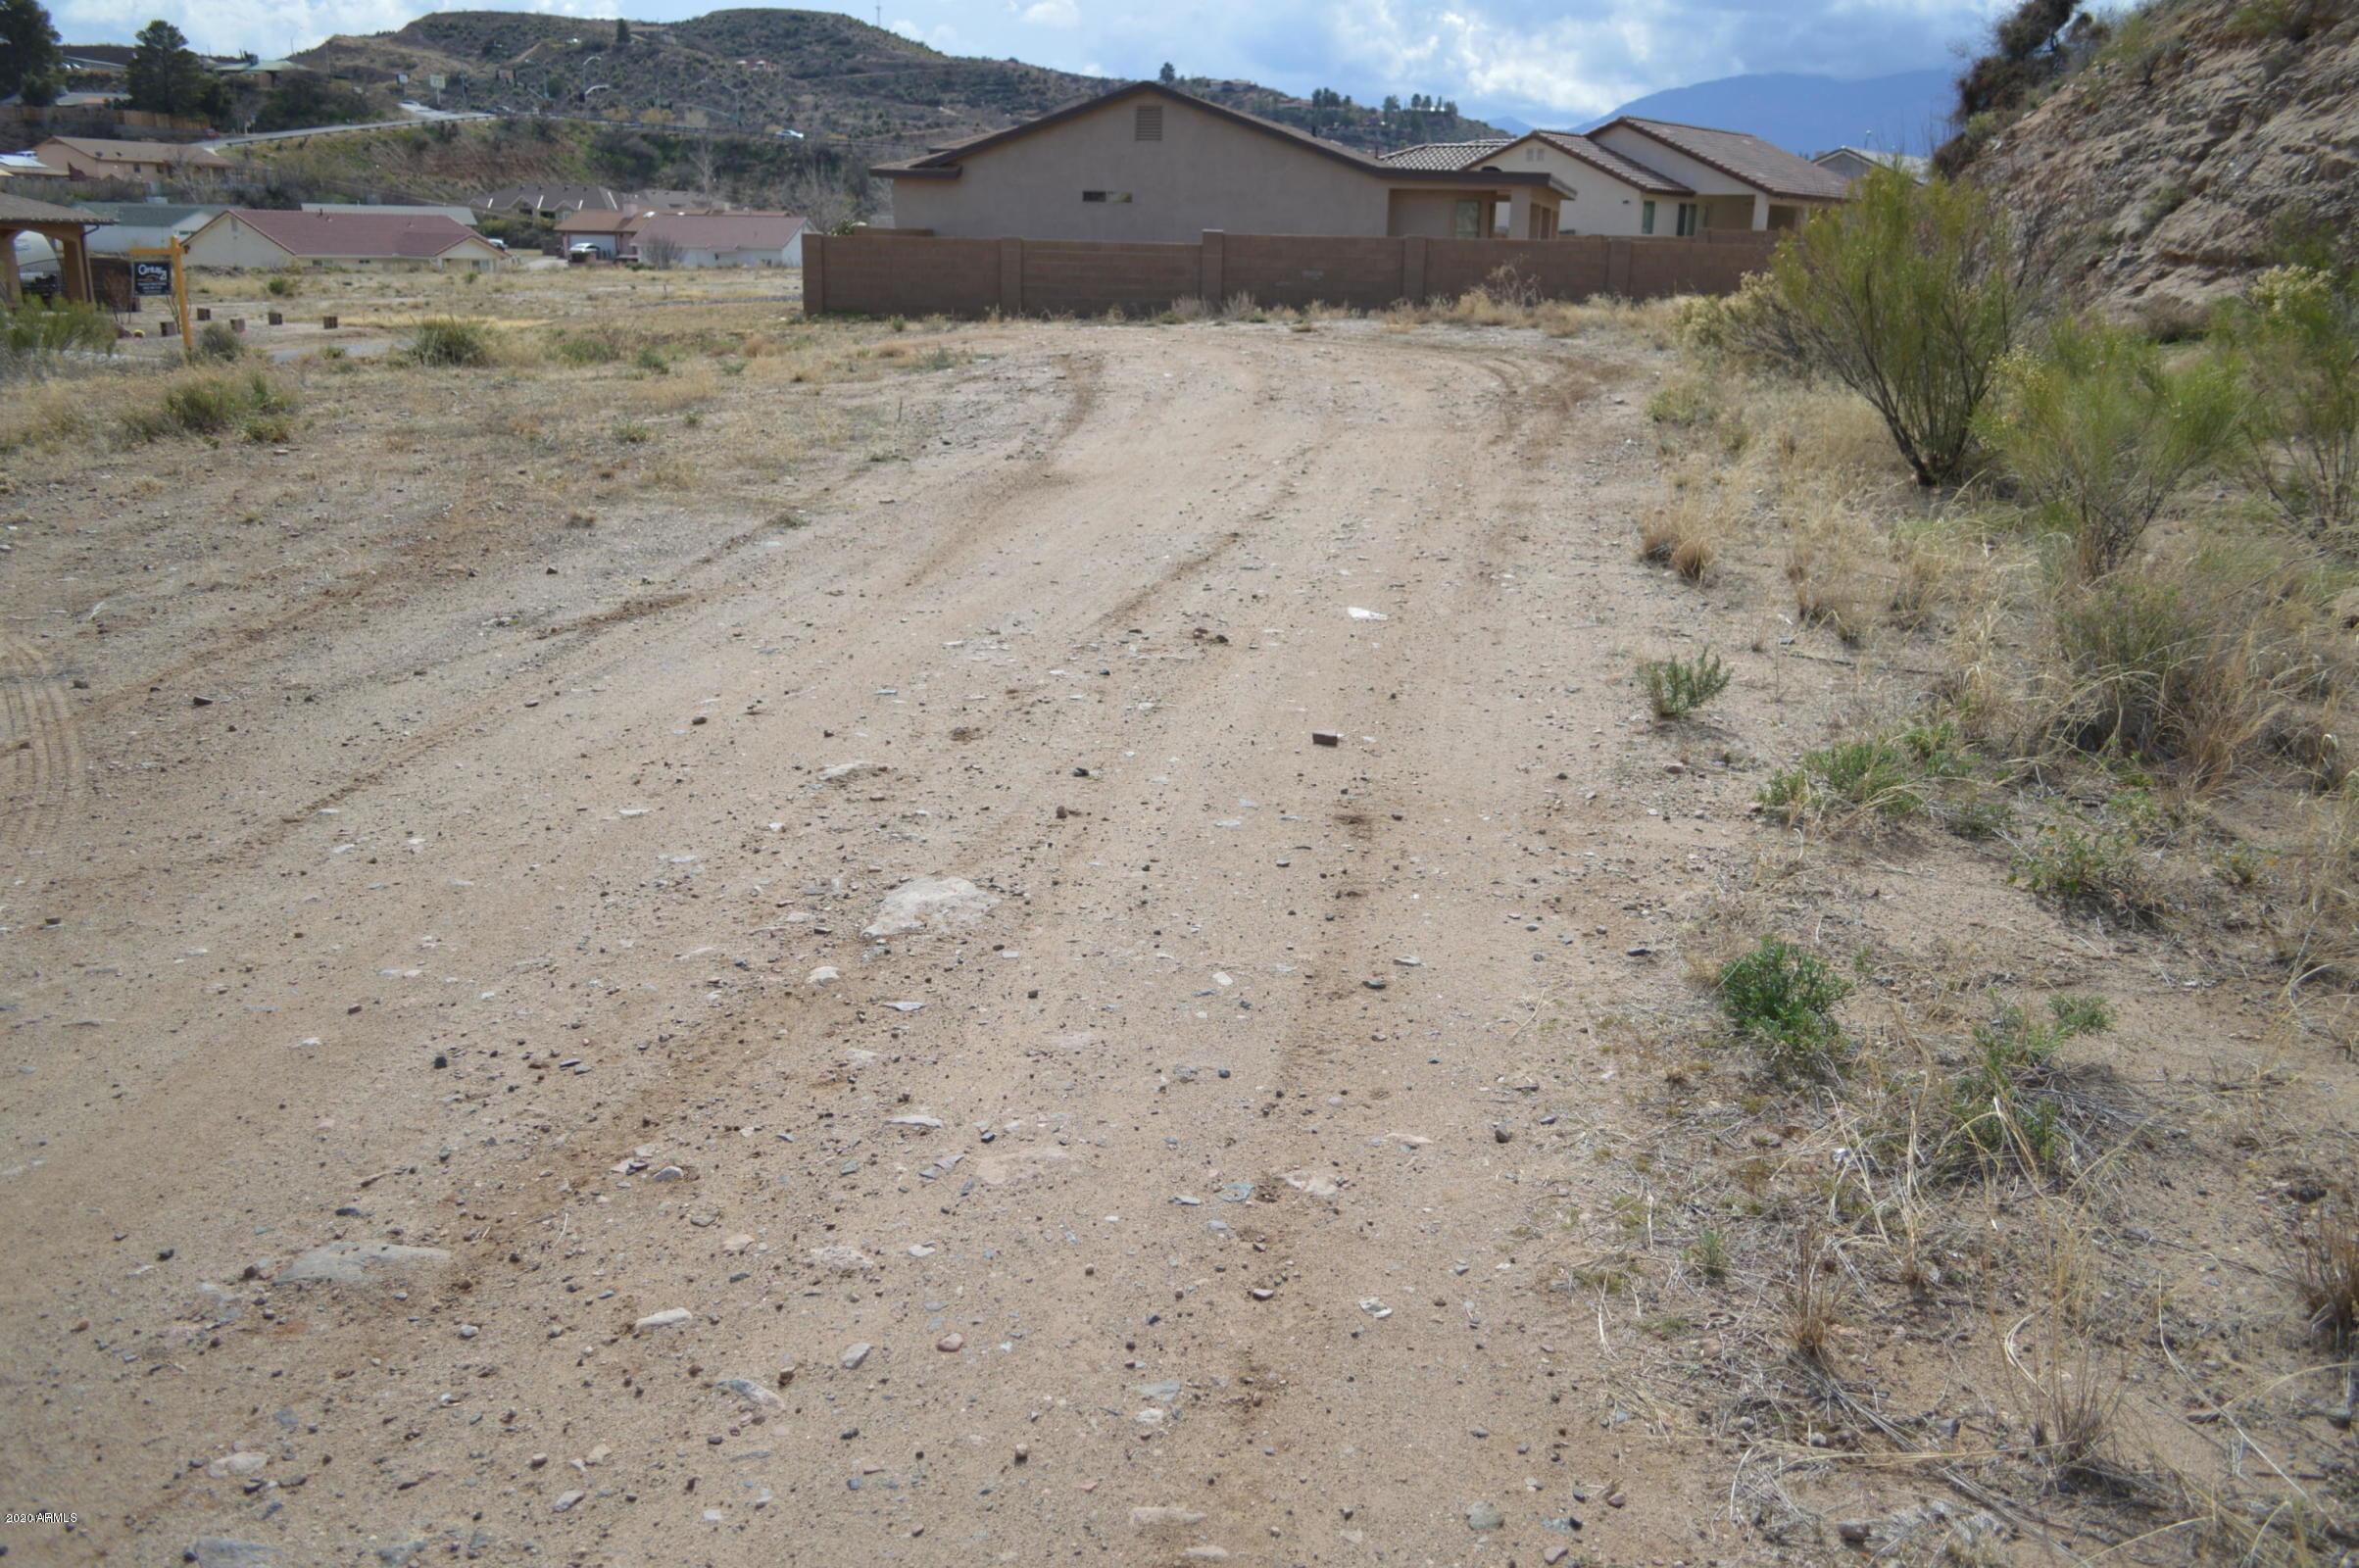 Lot 154 N Pinaleno Pass Road # 154, Globe, Arizona 85501, ,Land,For Sale,Lot 154 N Pinaleno Pass Road # 154,6019242